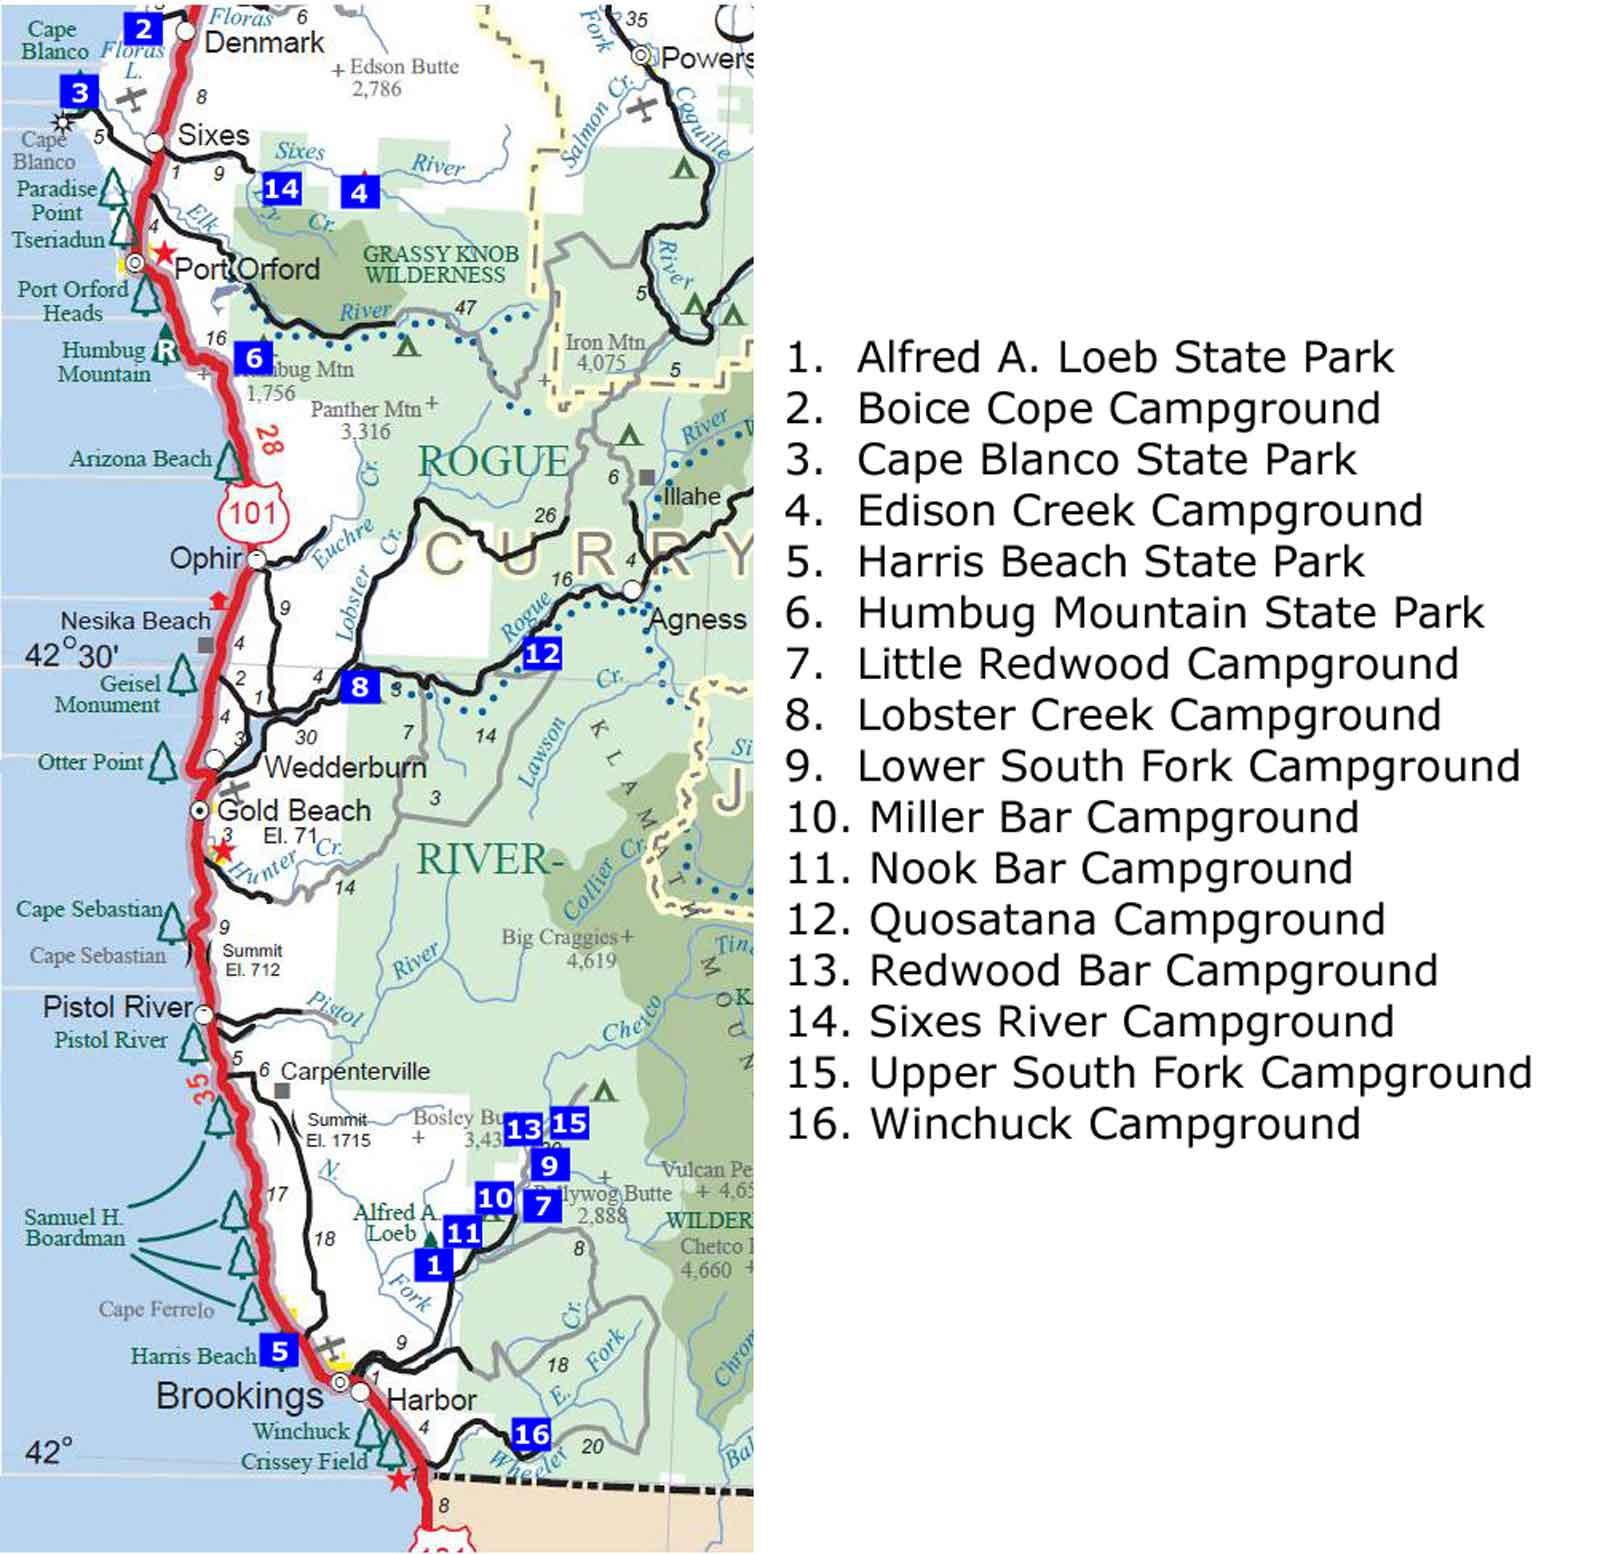 Southern California Edison Map Fresh Map Oregon And California Coast - Map Of Oregon And California Coastline